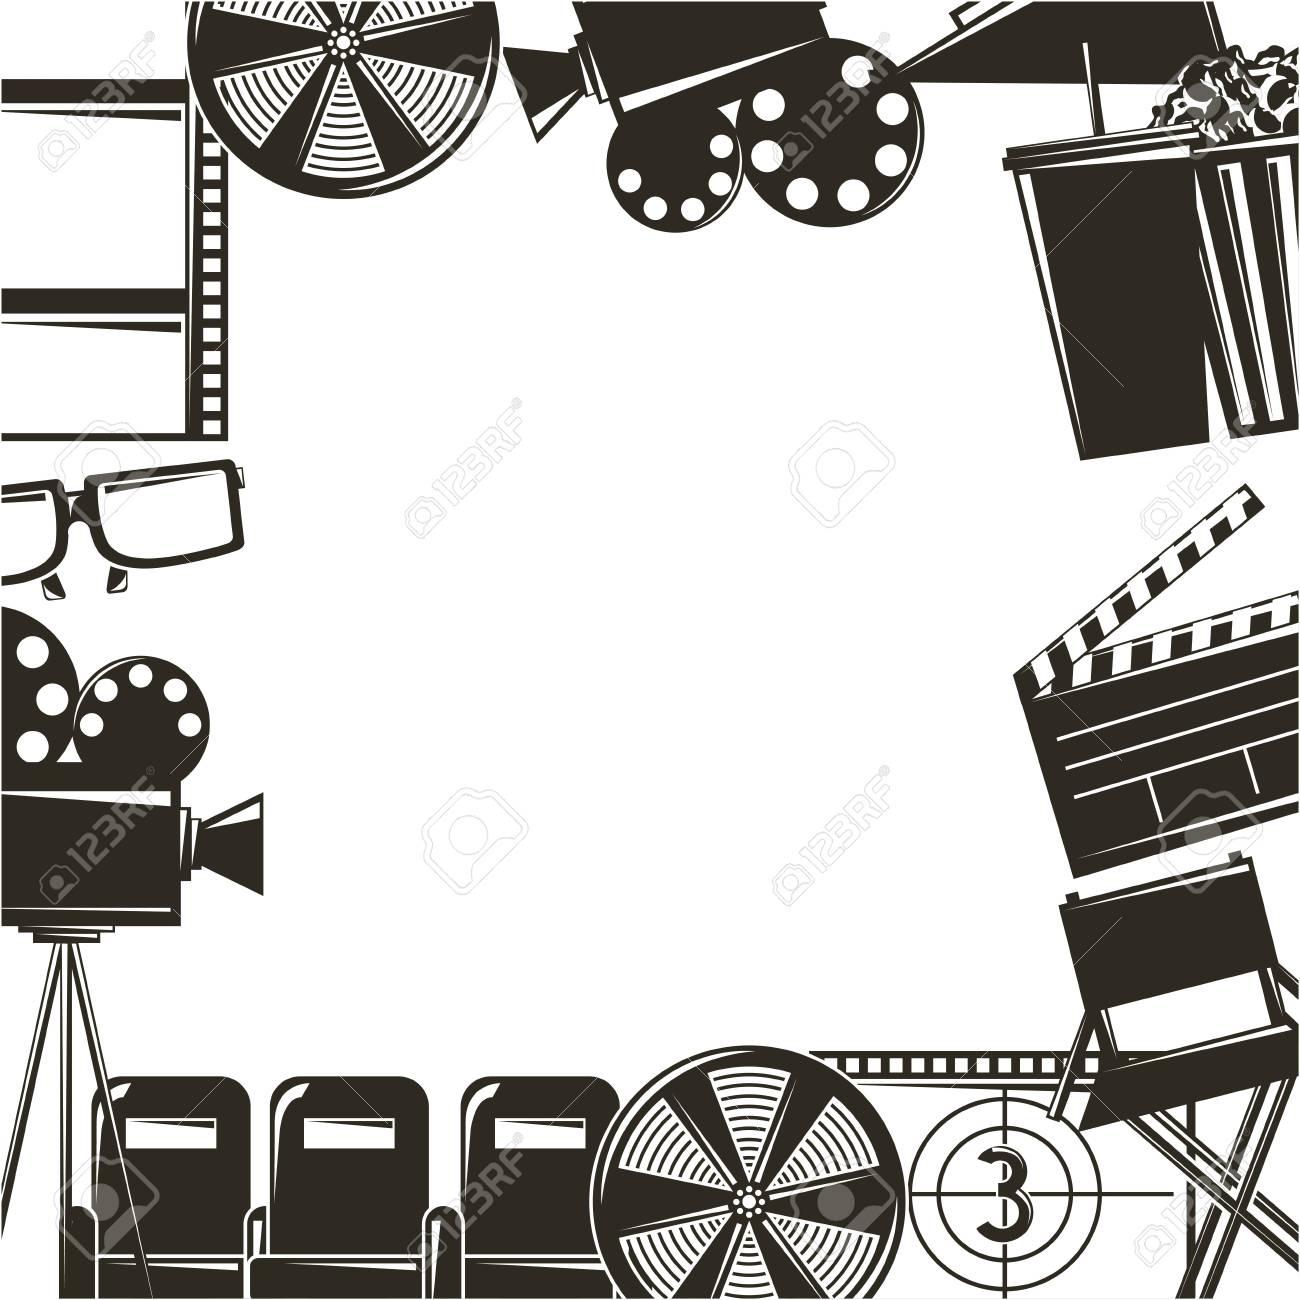 Border with cinema movie film equipment icons..